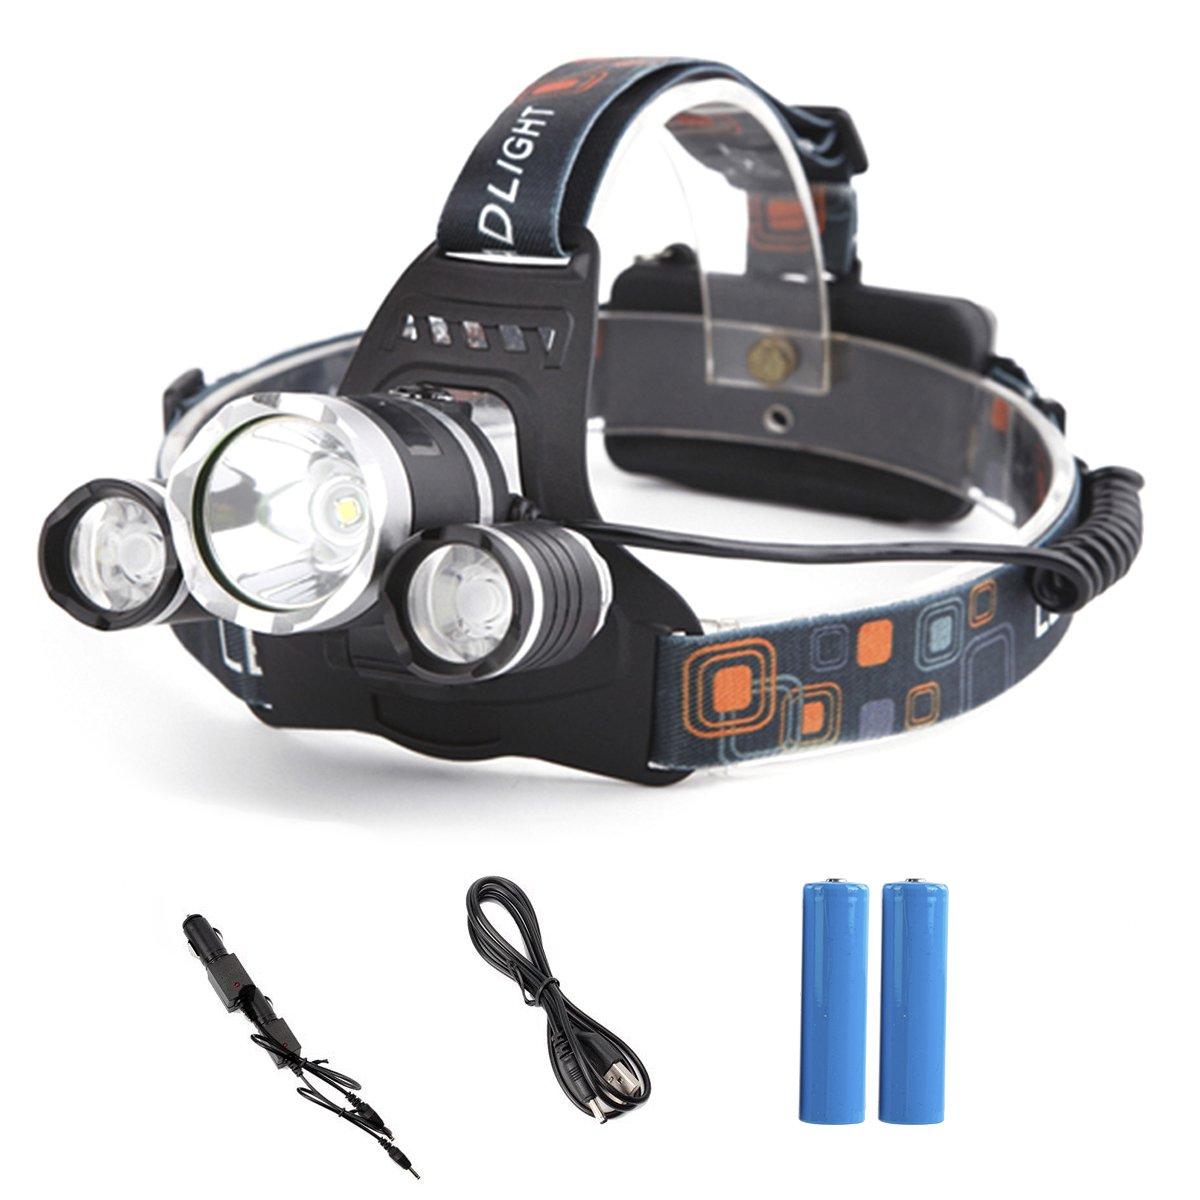 GES 5000LM LED recargable antorcha de cabeza con 4 modos 3 T6 Focus casco de escalada impermeable ajustable linterna HeadLamp Headwear para ir de excursión acampar Caza Ciclismo pesca luz de seguridad GES Co. Ltd.